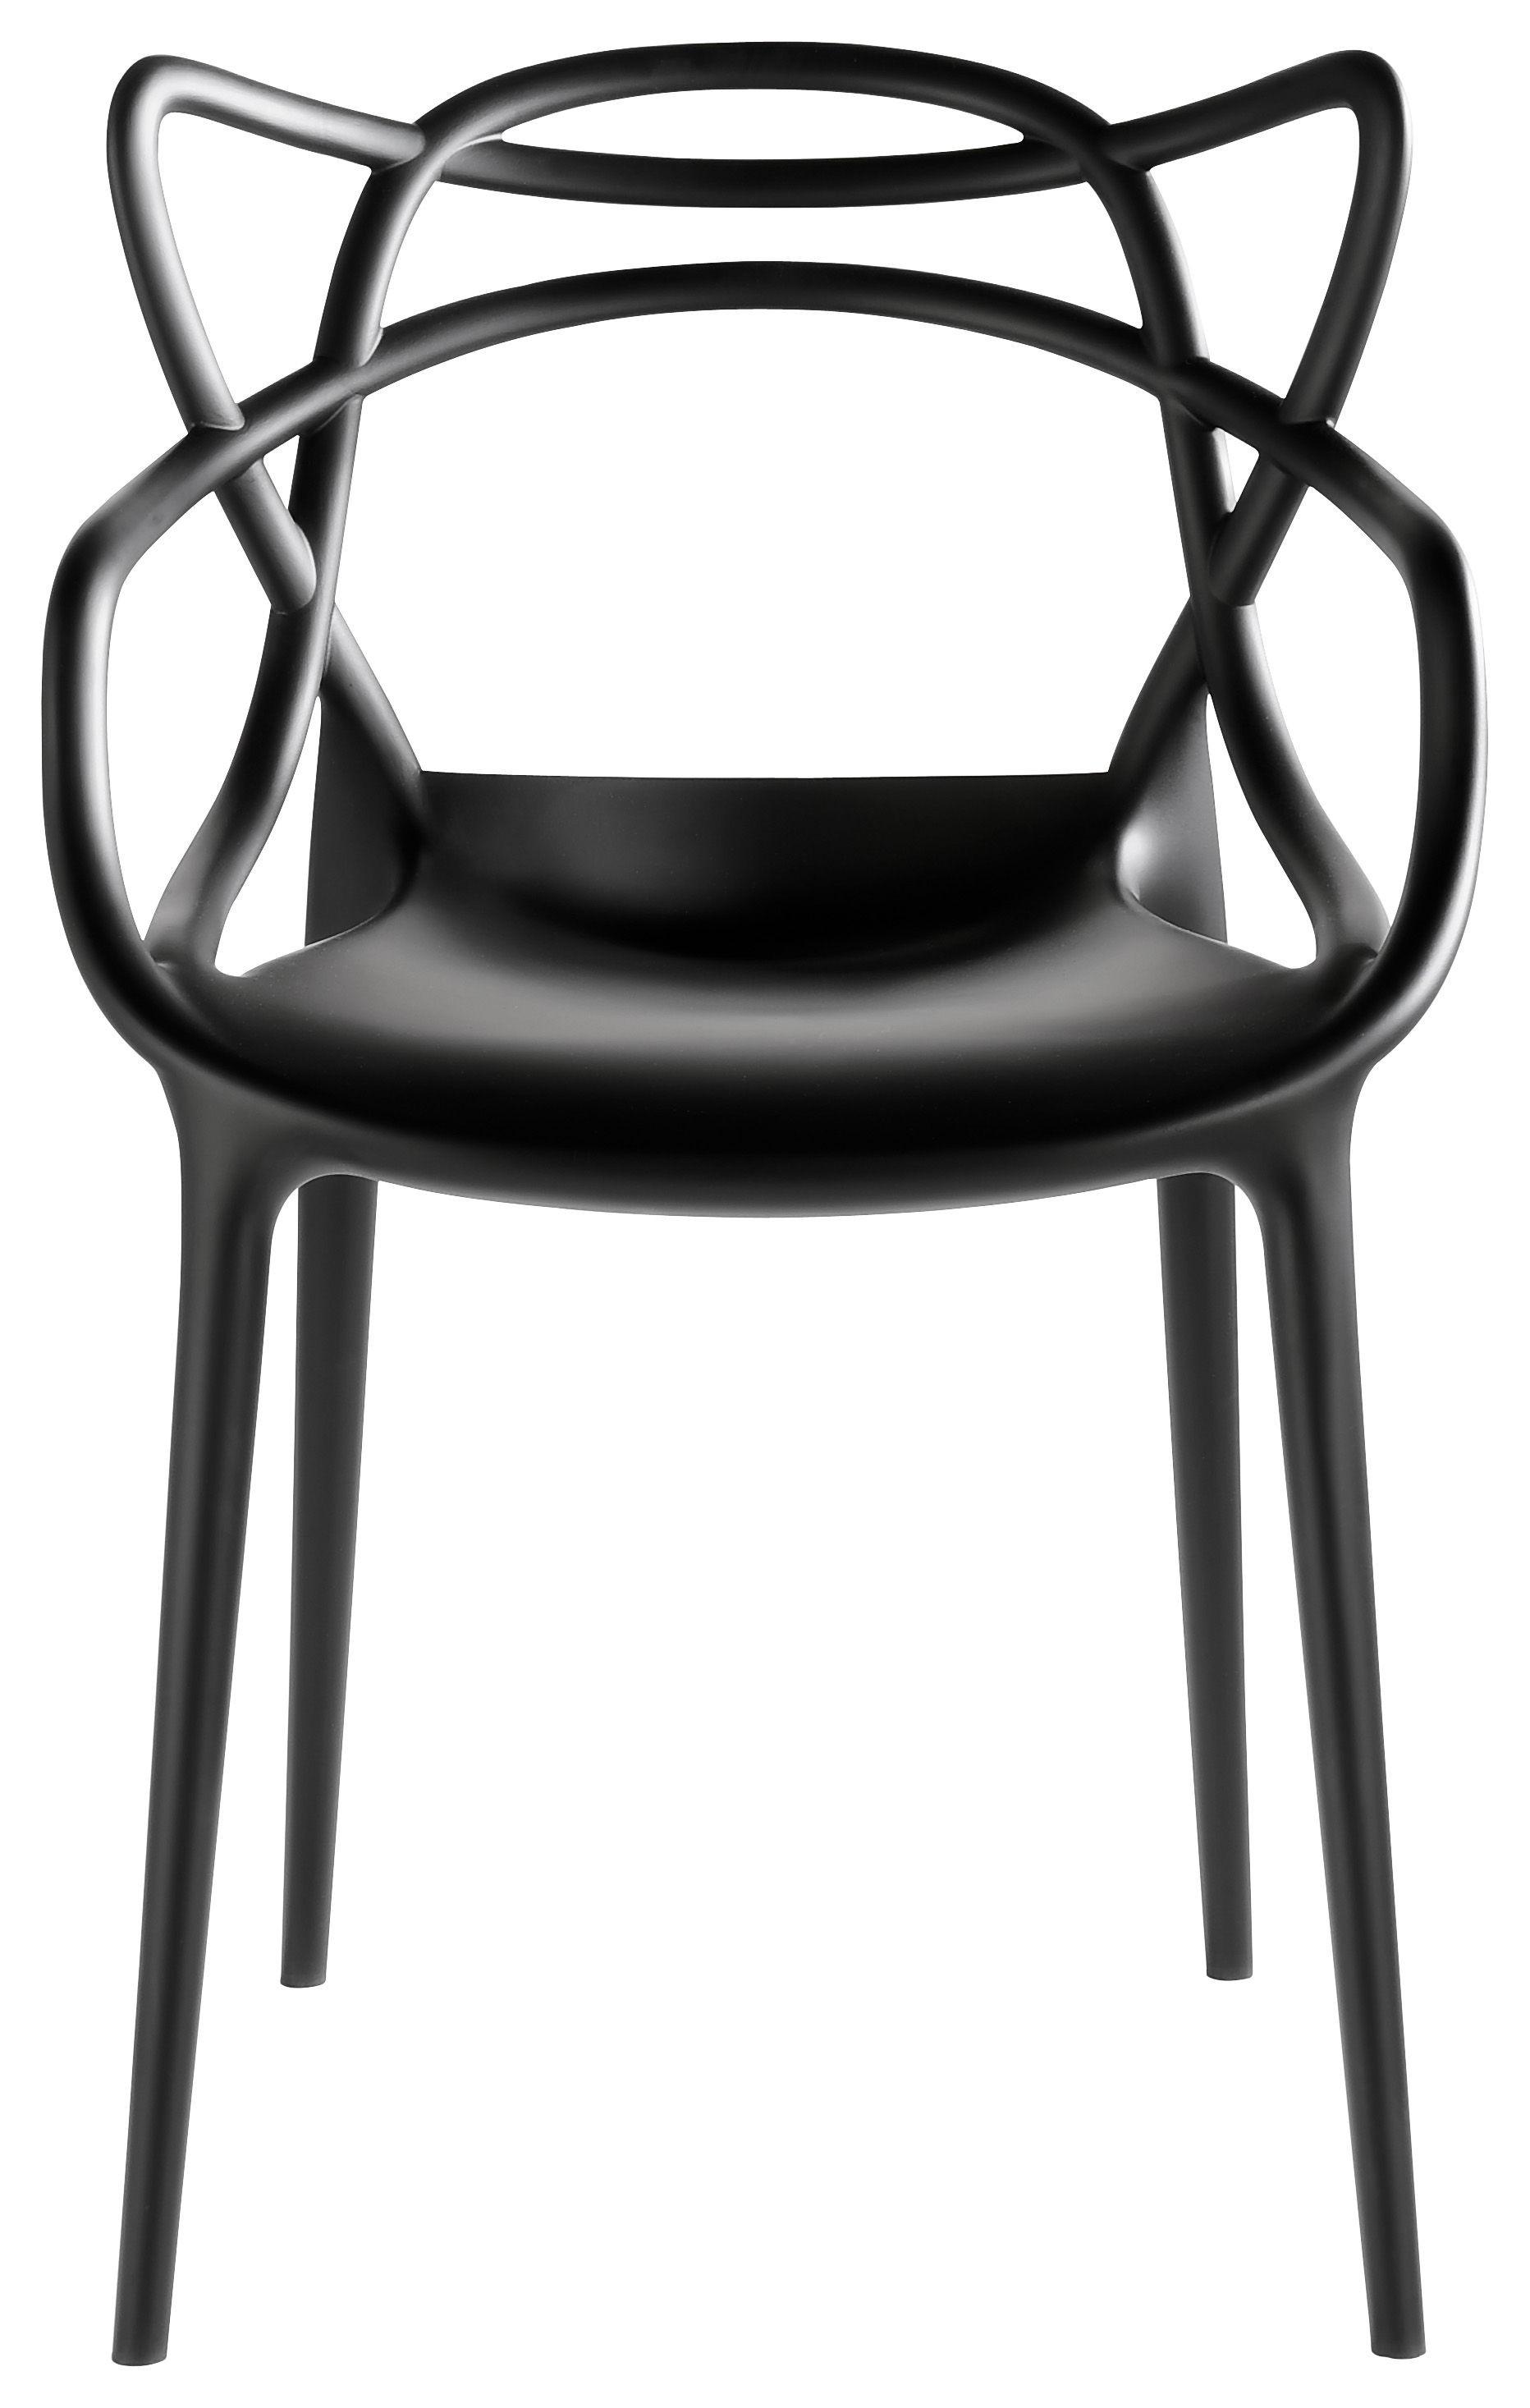 kartell masters silla embalaje 2 uds acabado 5865 l mparas de dise o. Black Bedroom Furniture Sets. Home Design Ideas